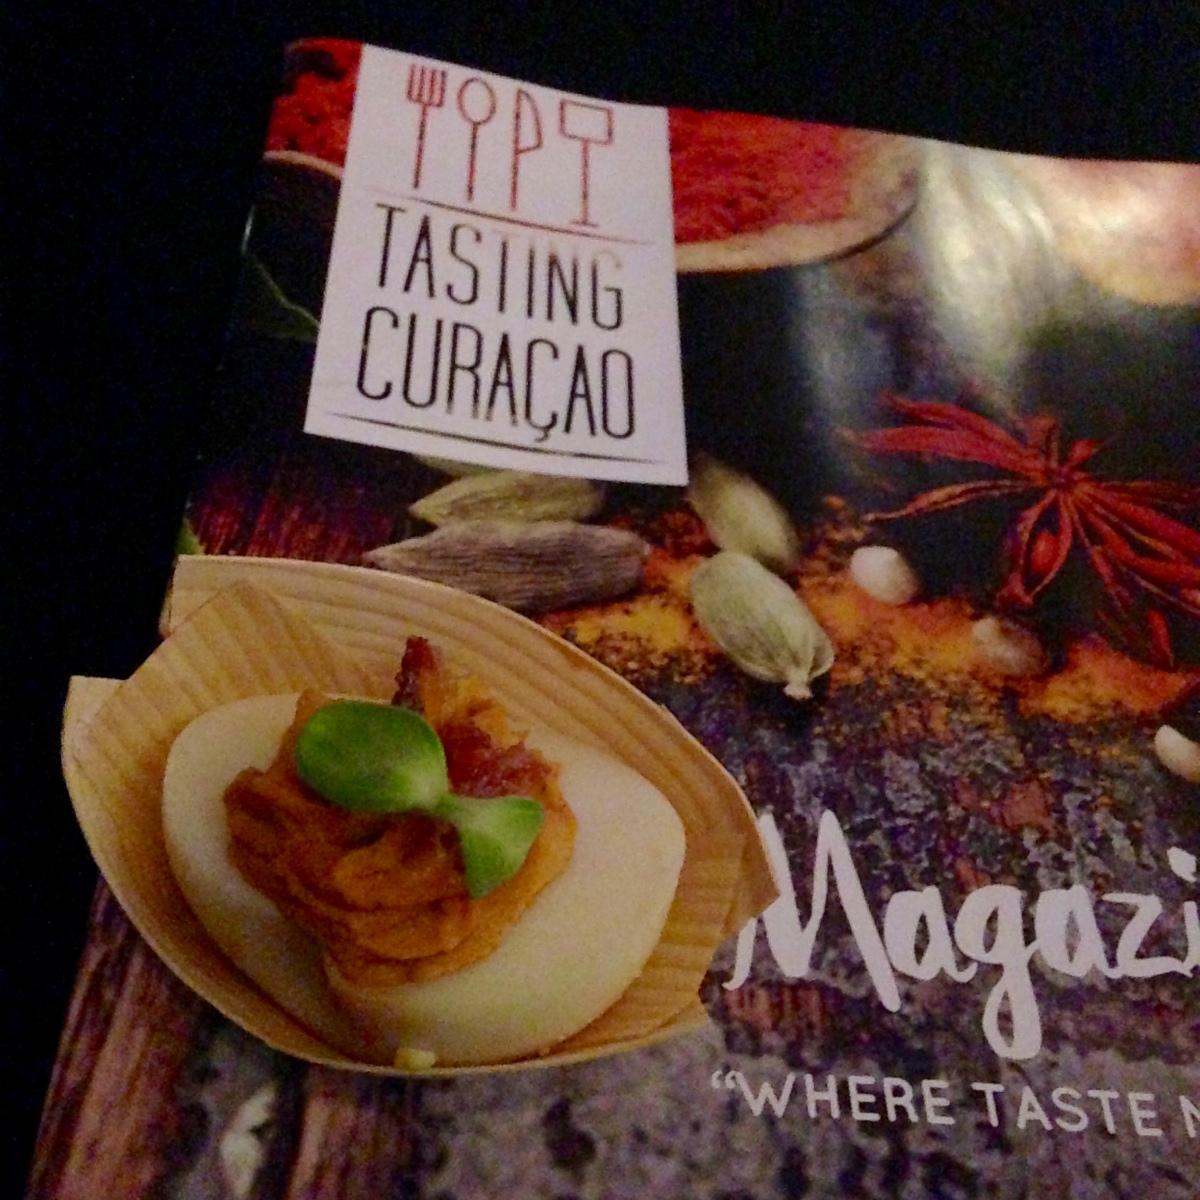 Tasting Curacao ta lansa su promérevista